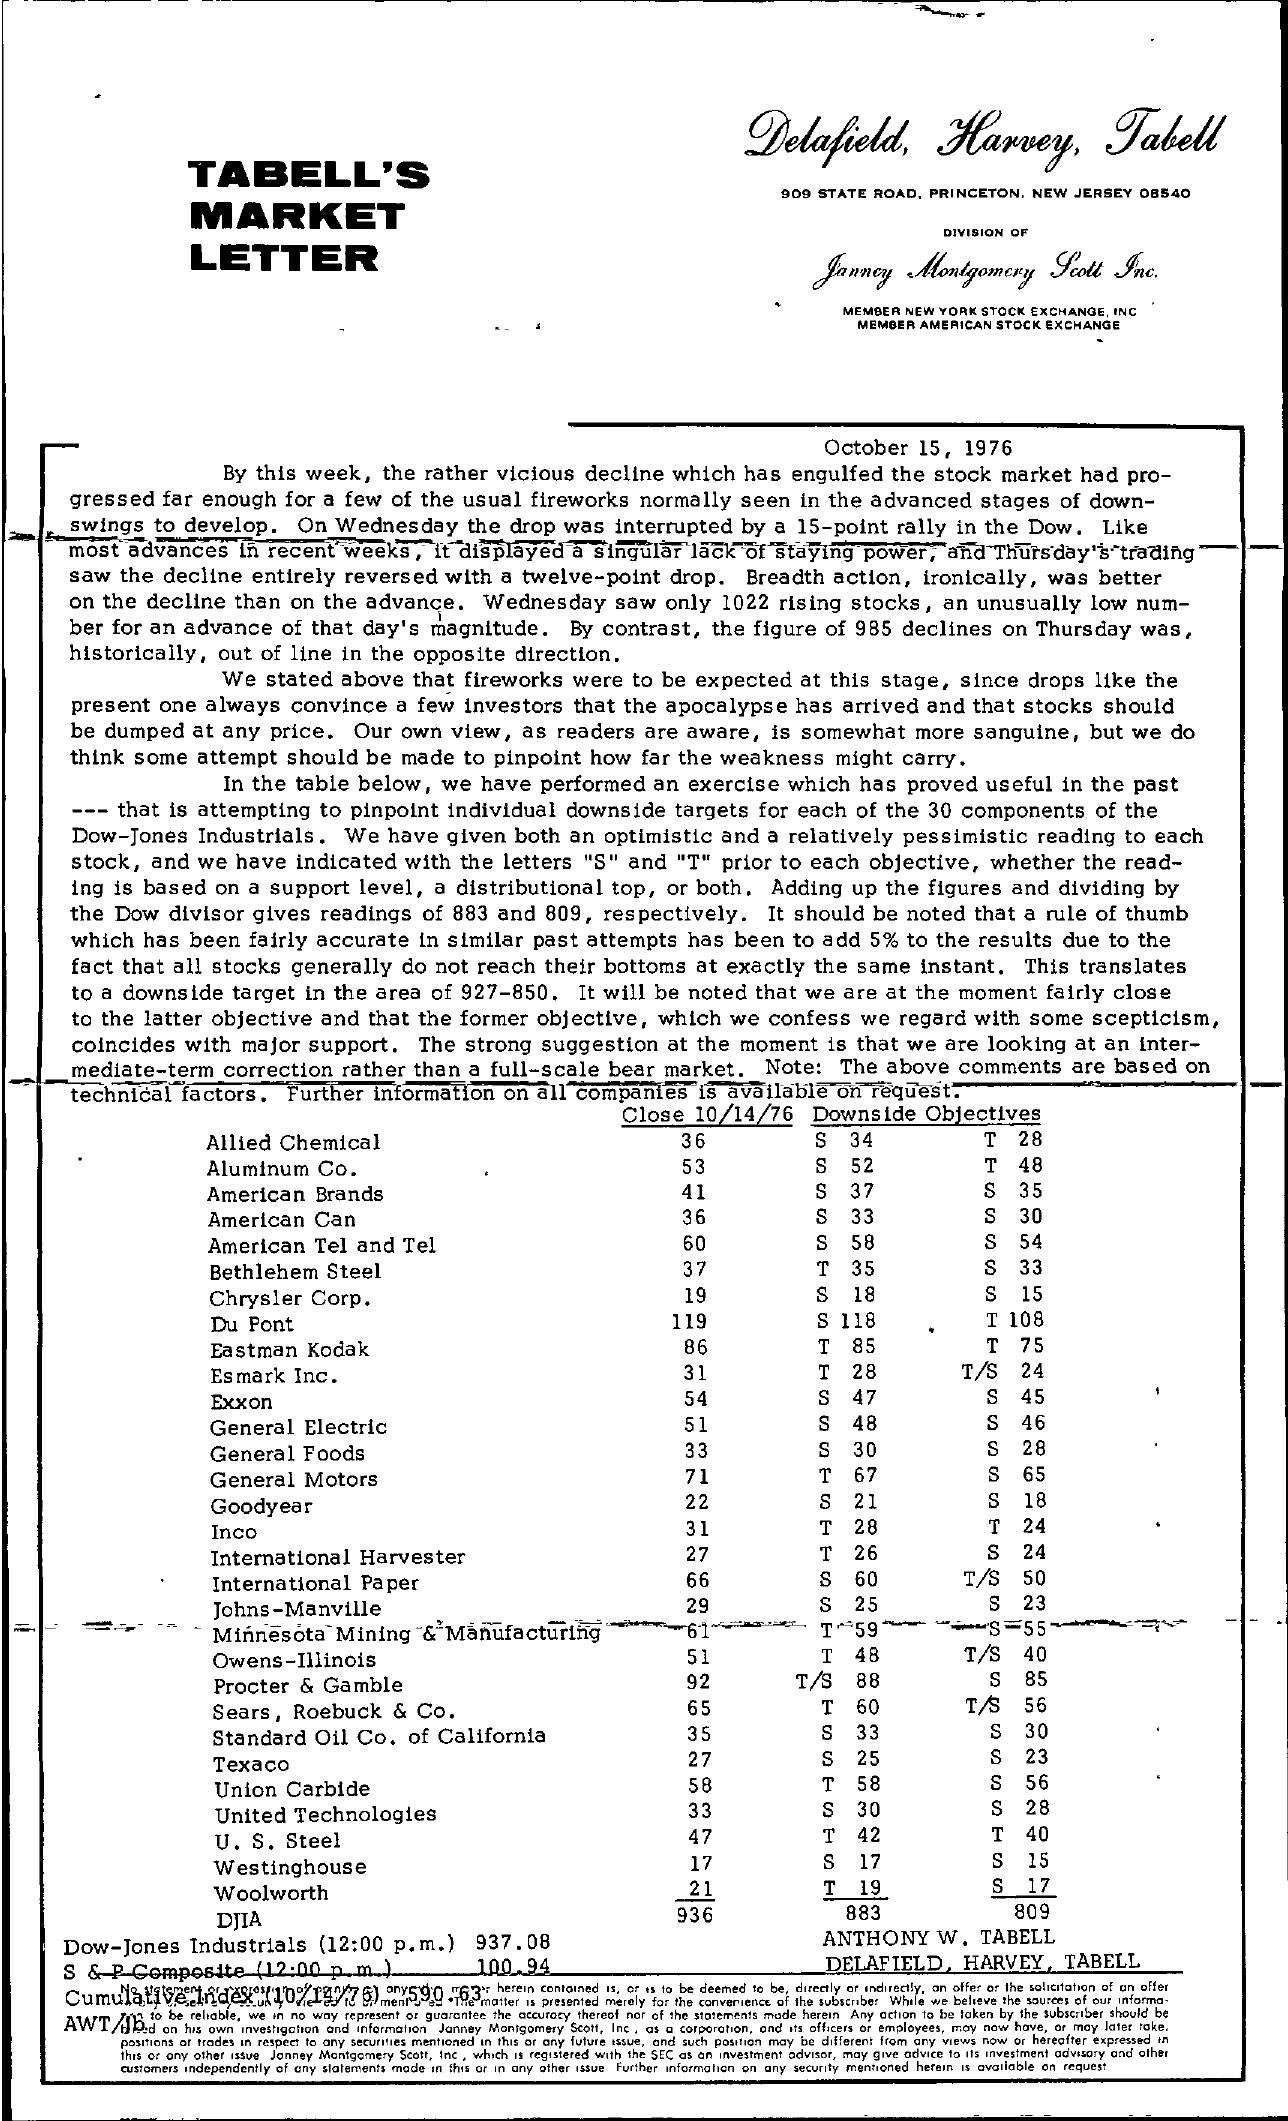 Tabell's Market Letter - October 15, 1976